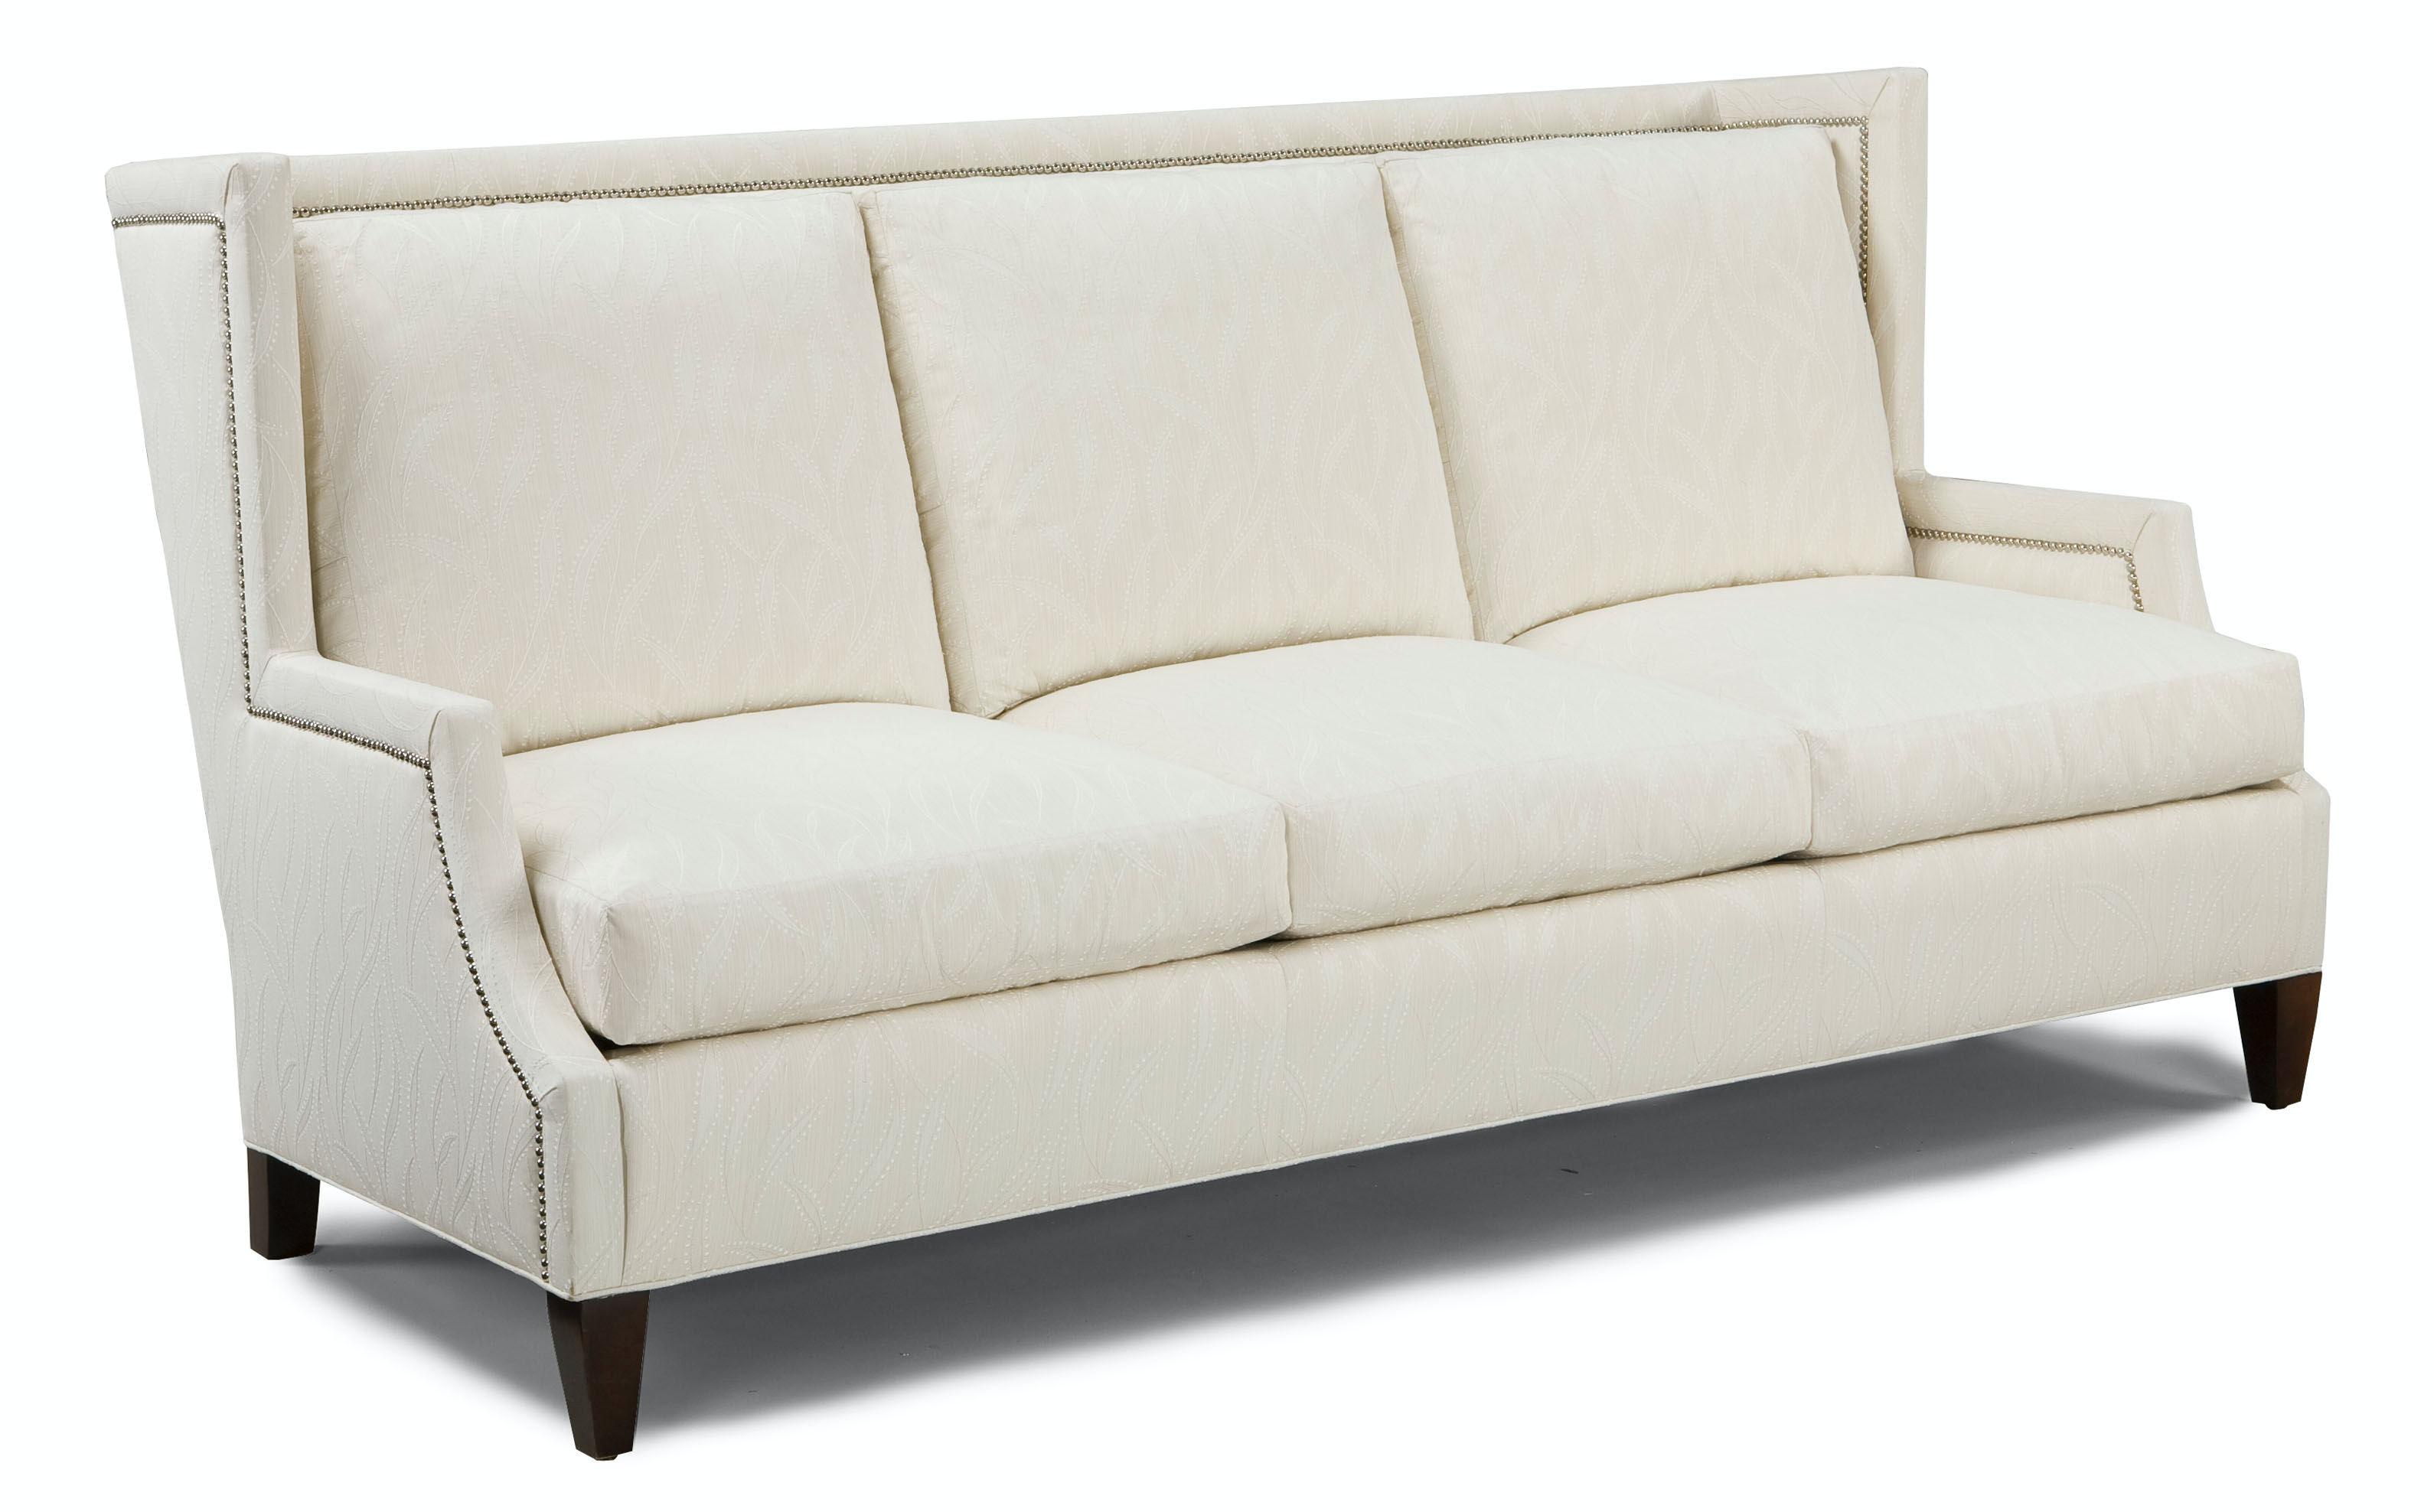 LA Waters Furniture